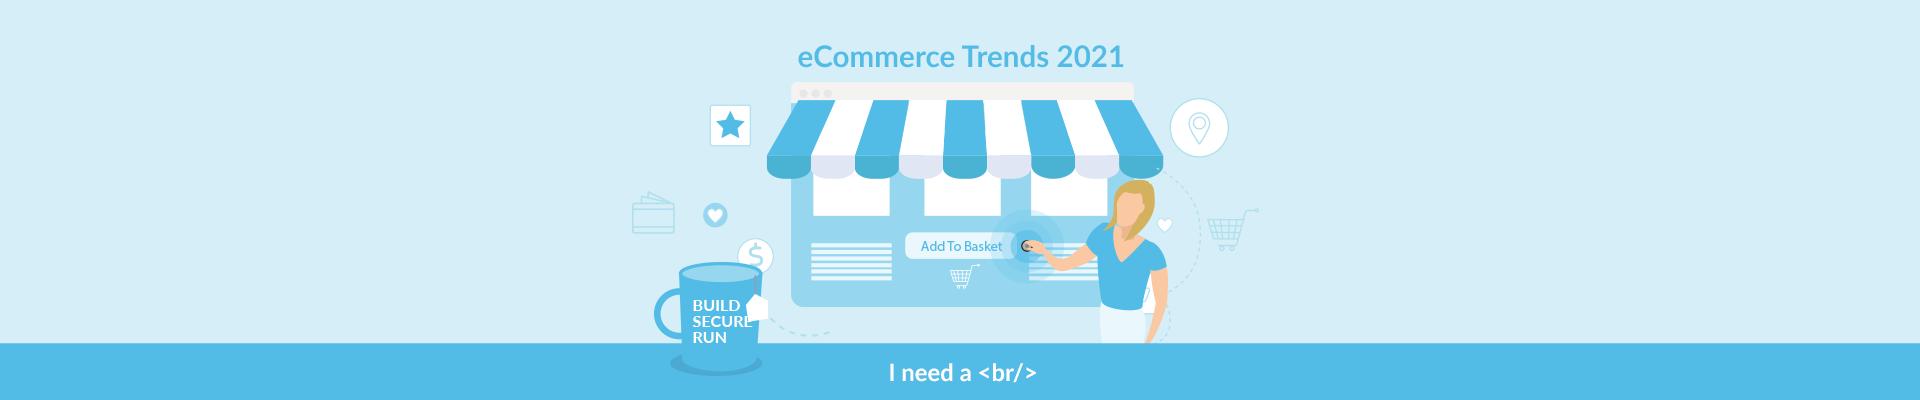 eCommerce trends 2021 Plesk